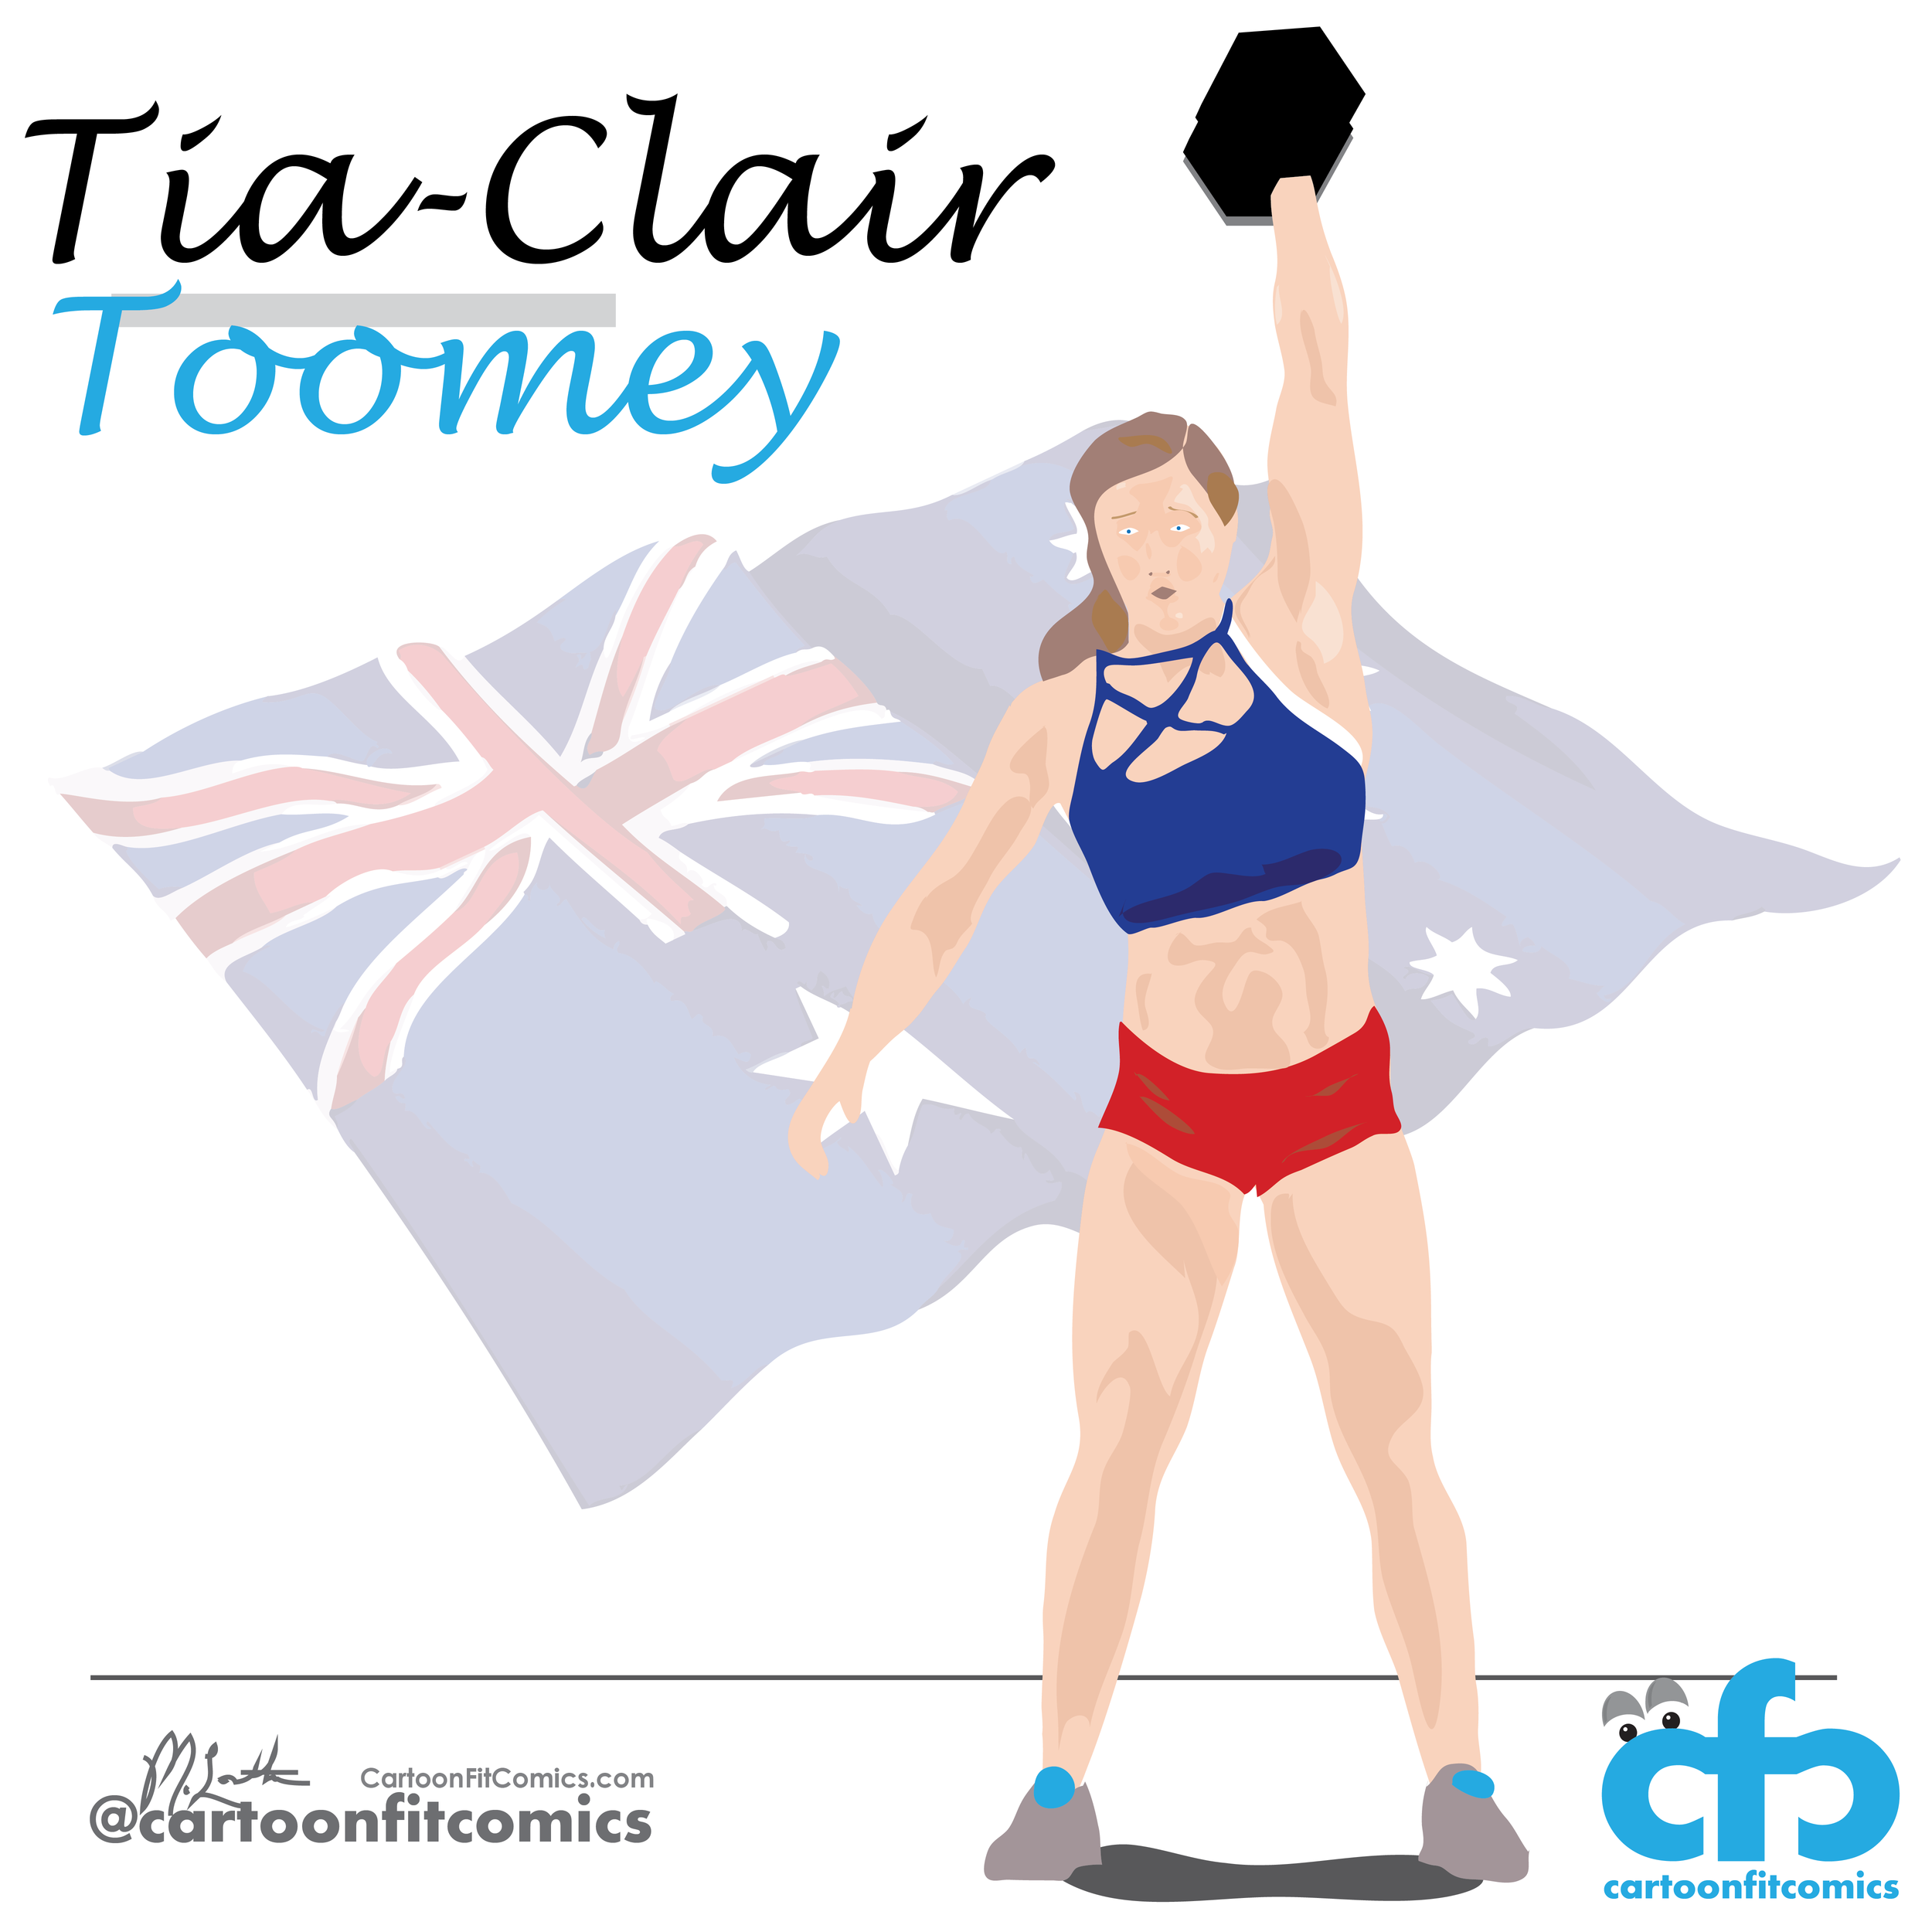 Tia-Clair Toomey